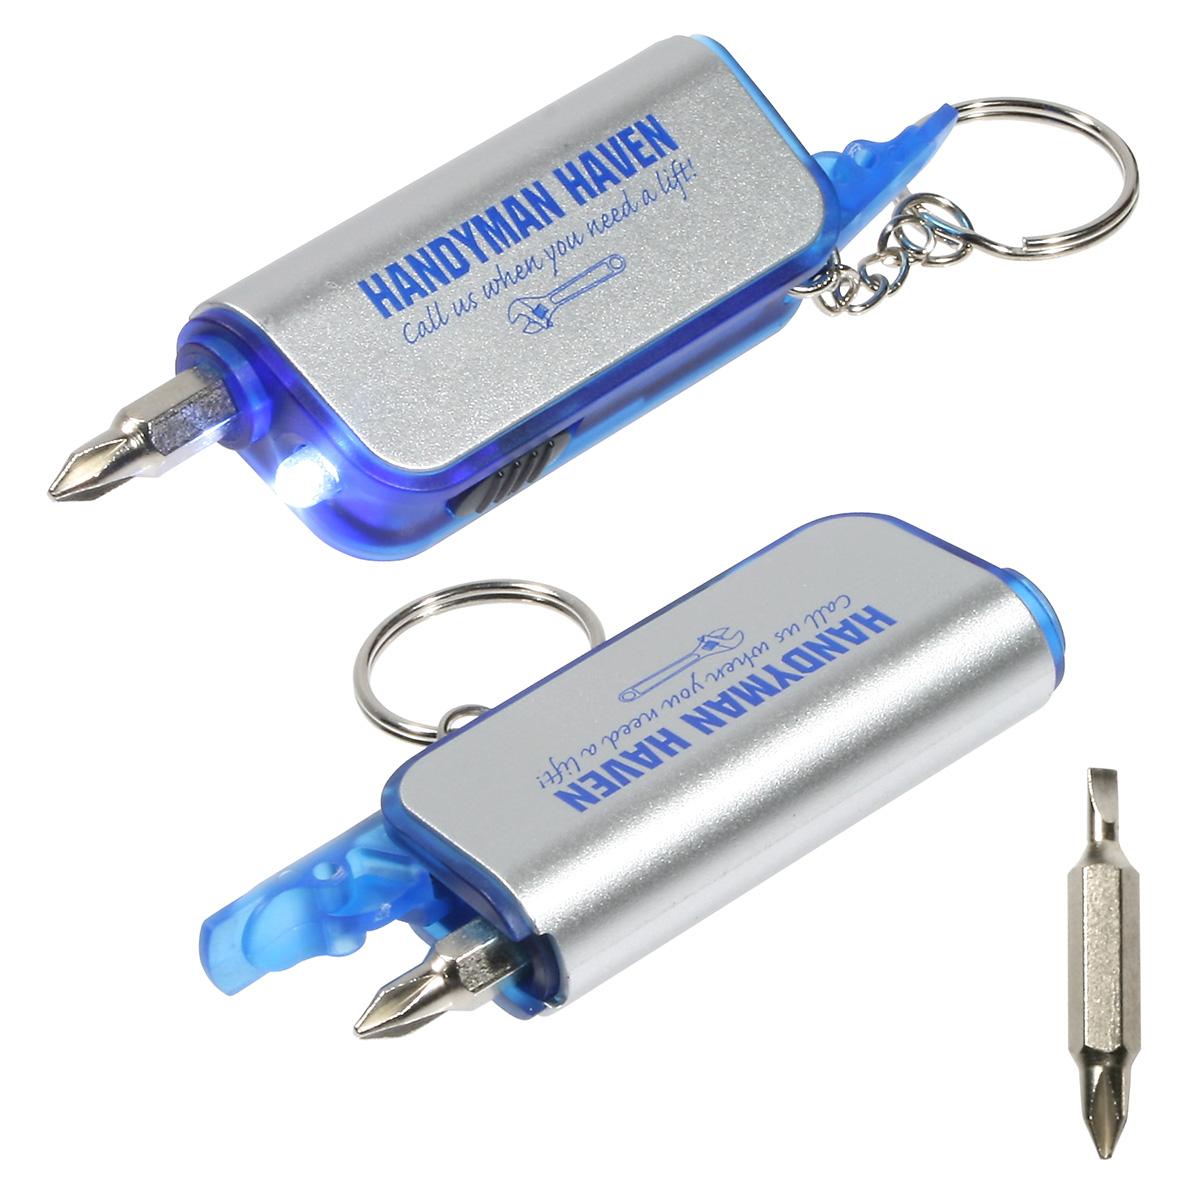 Screwdriver Flashlight Keychain, WTT-SF09 - 1 Colour Imprint